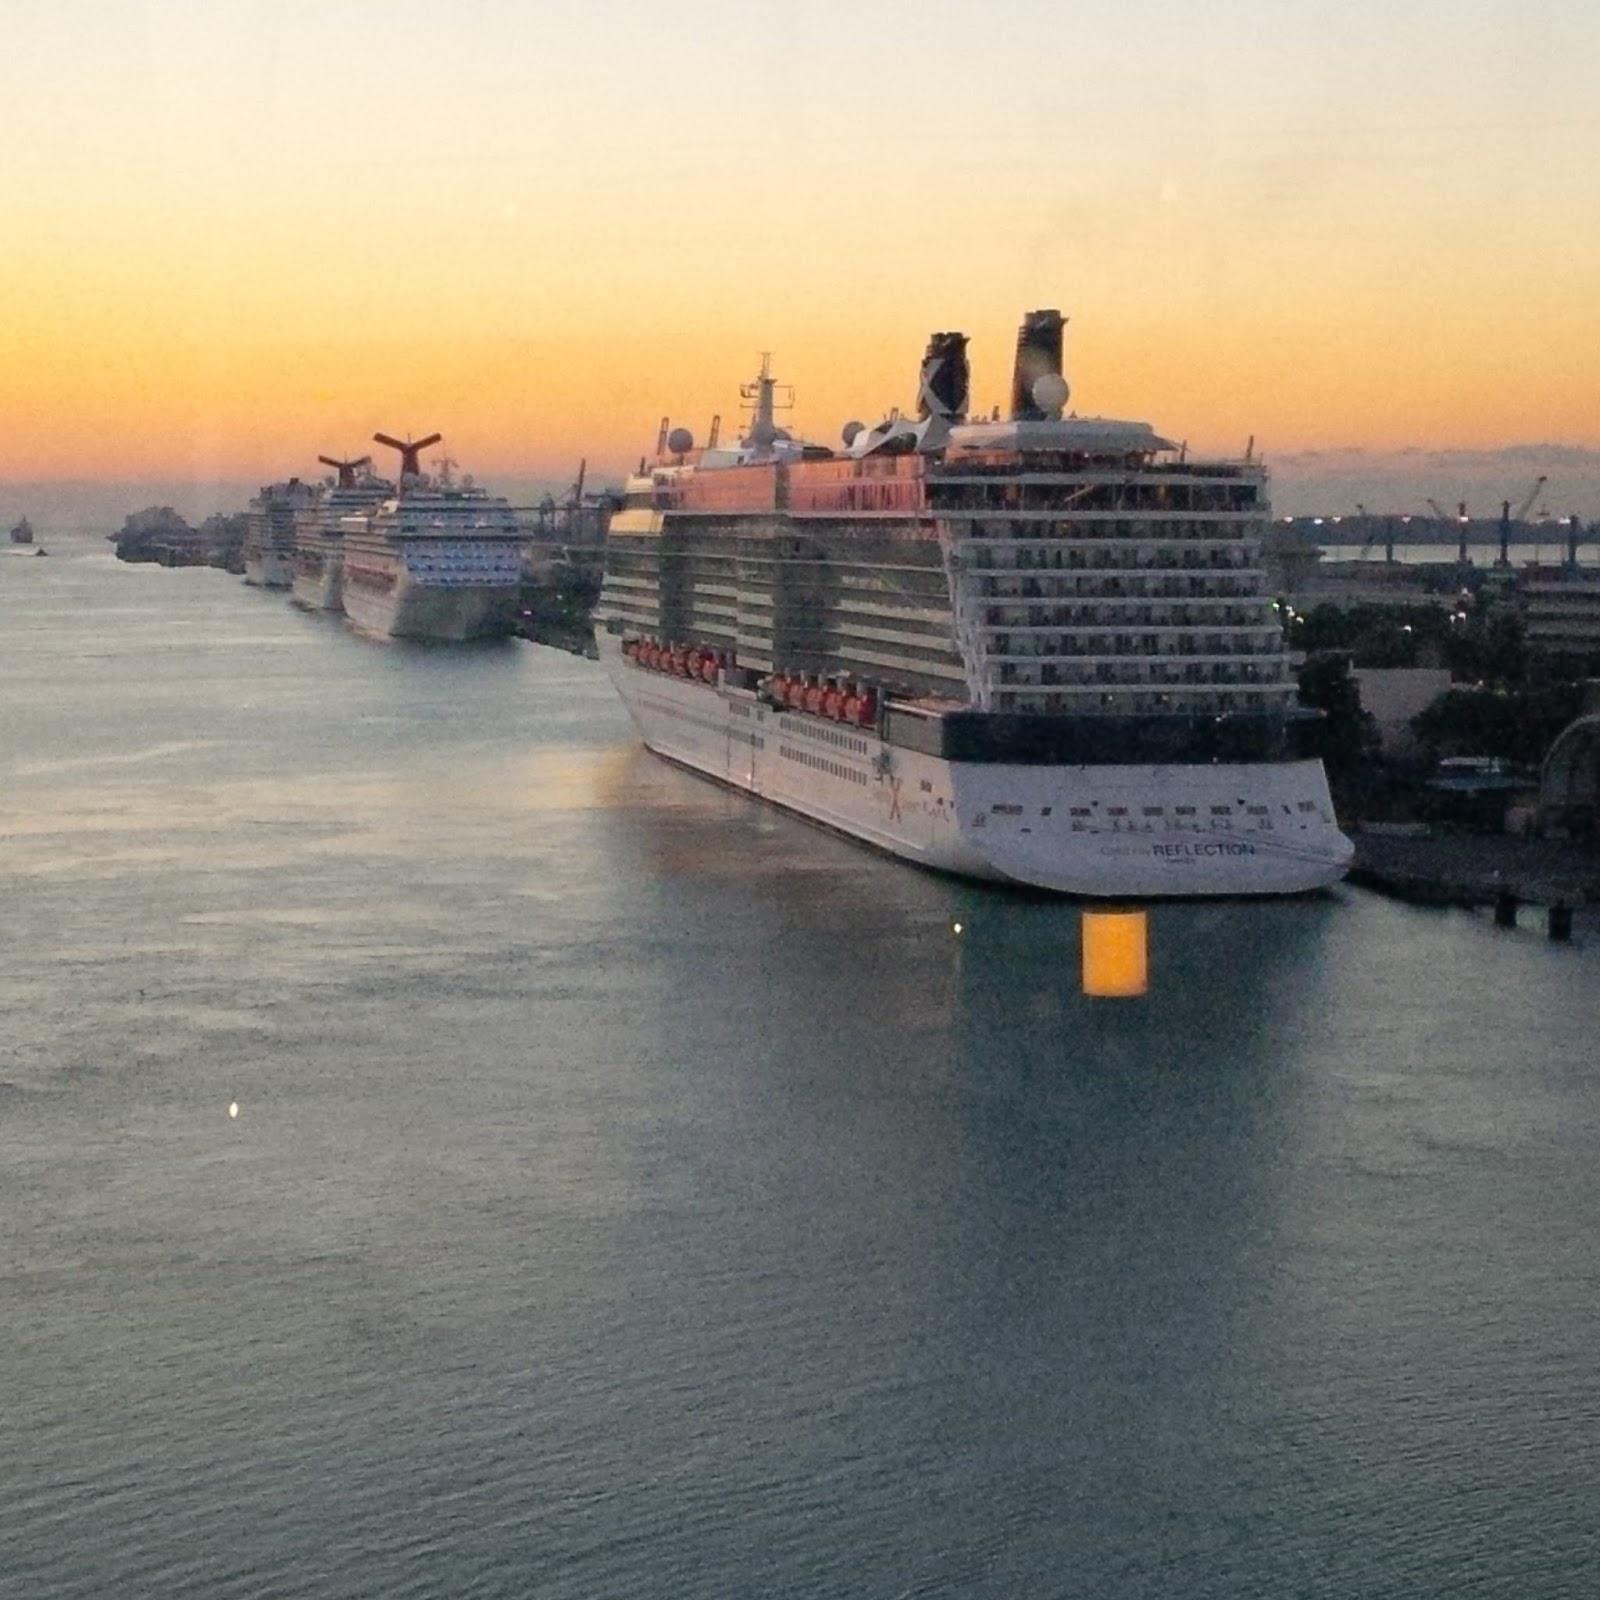 Port Of Miami Cruise Lines: Cruise Diva: Port Of Miami Tunnel Opens